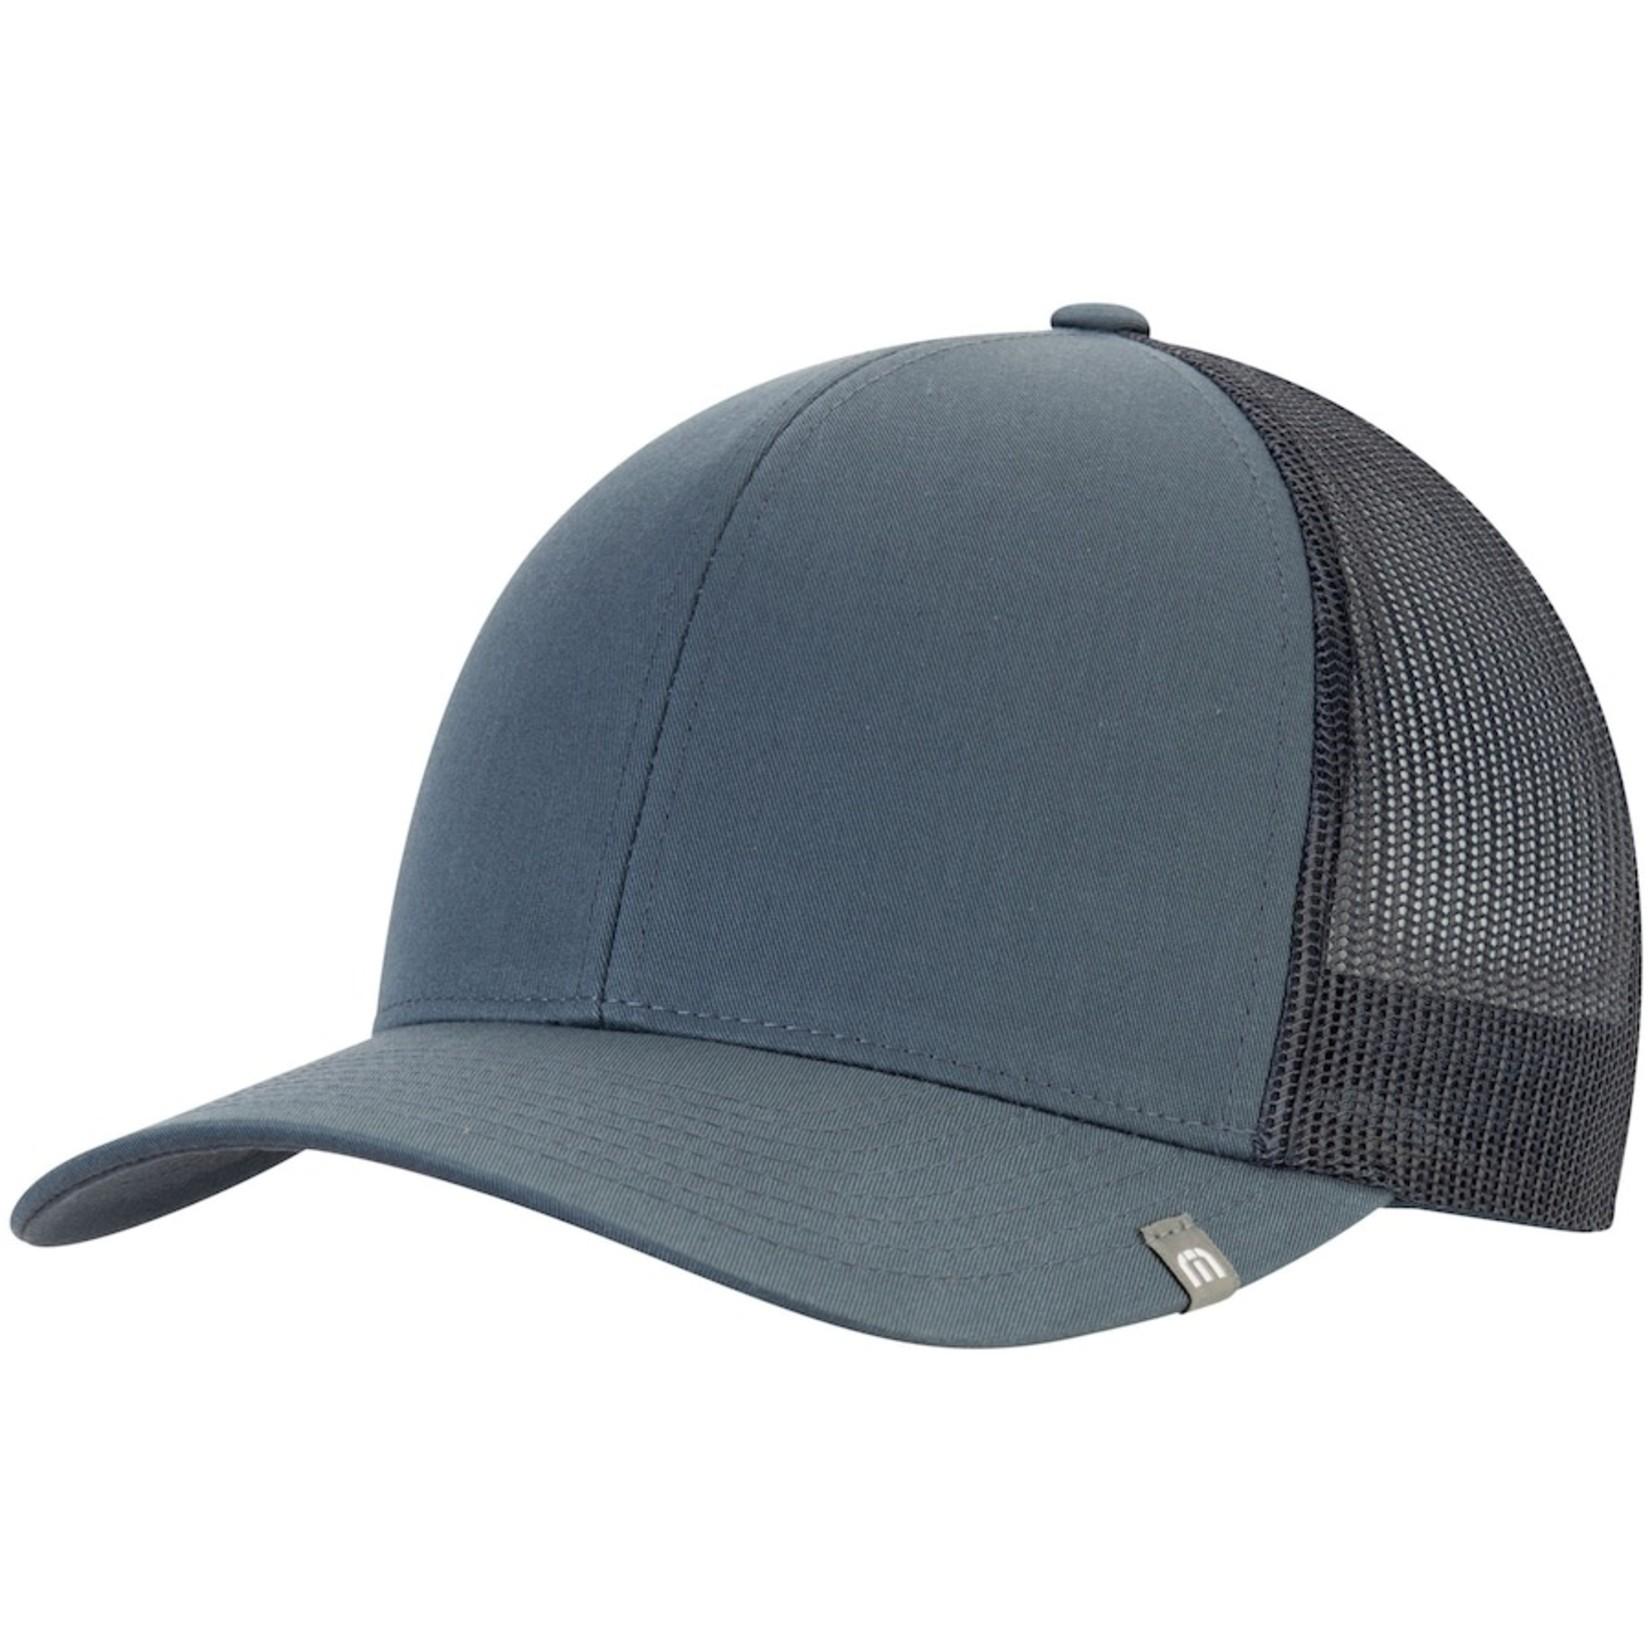 Travis Mathew TM Widder Hat Men's Adjustable